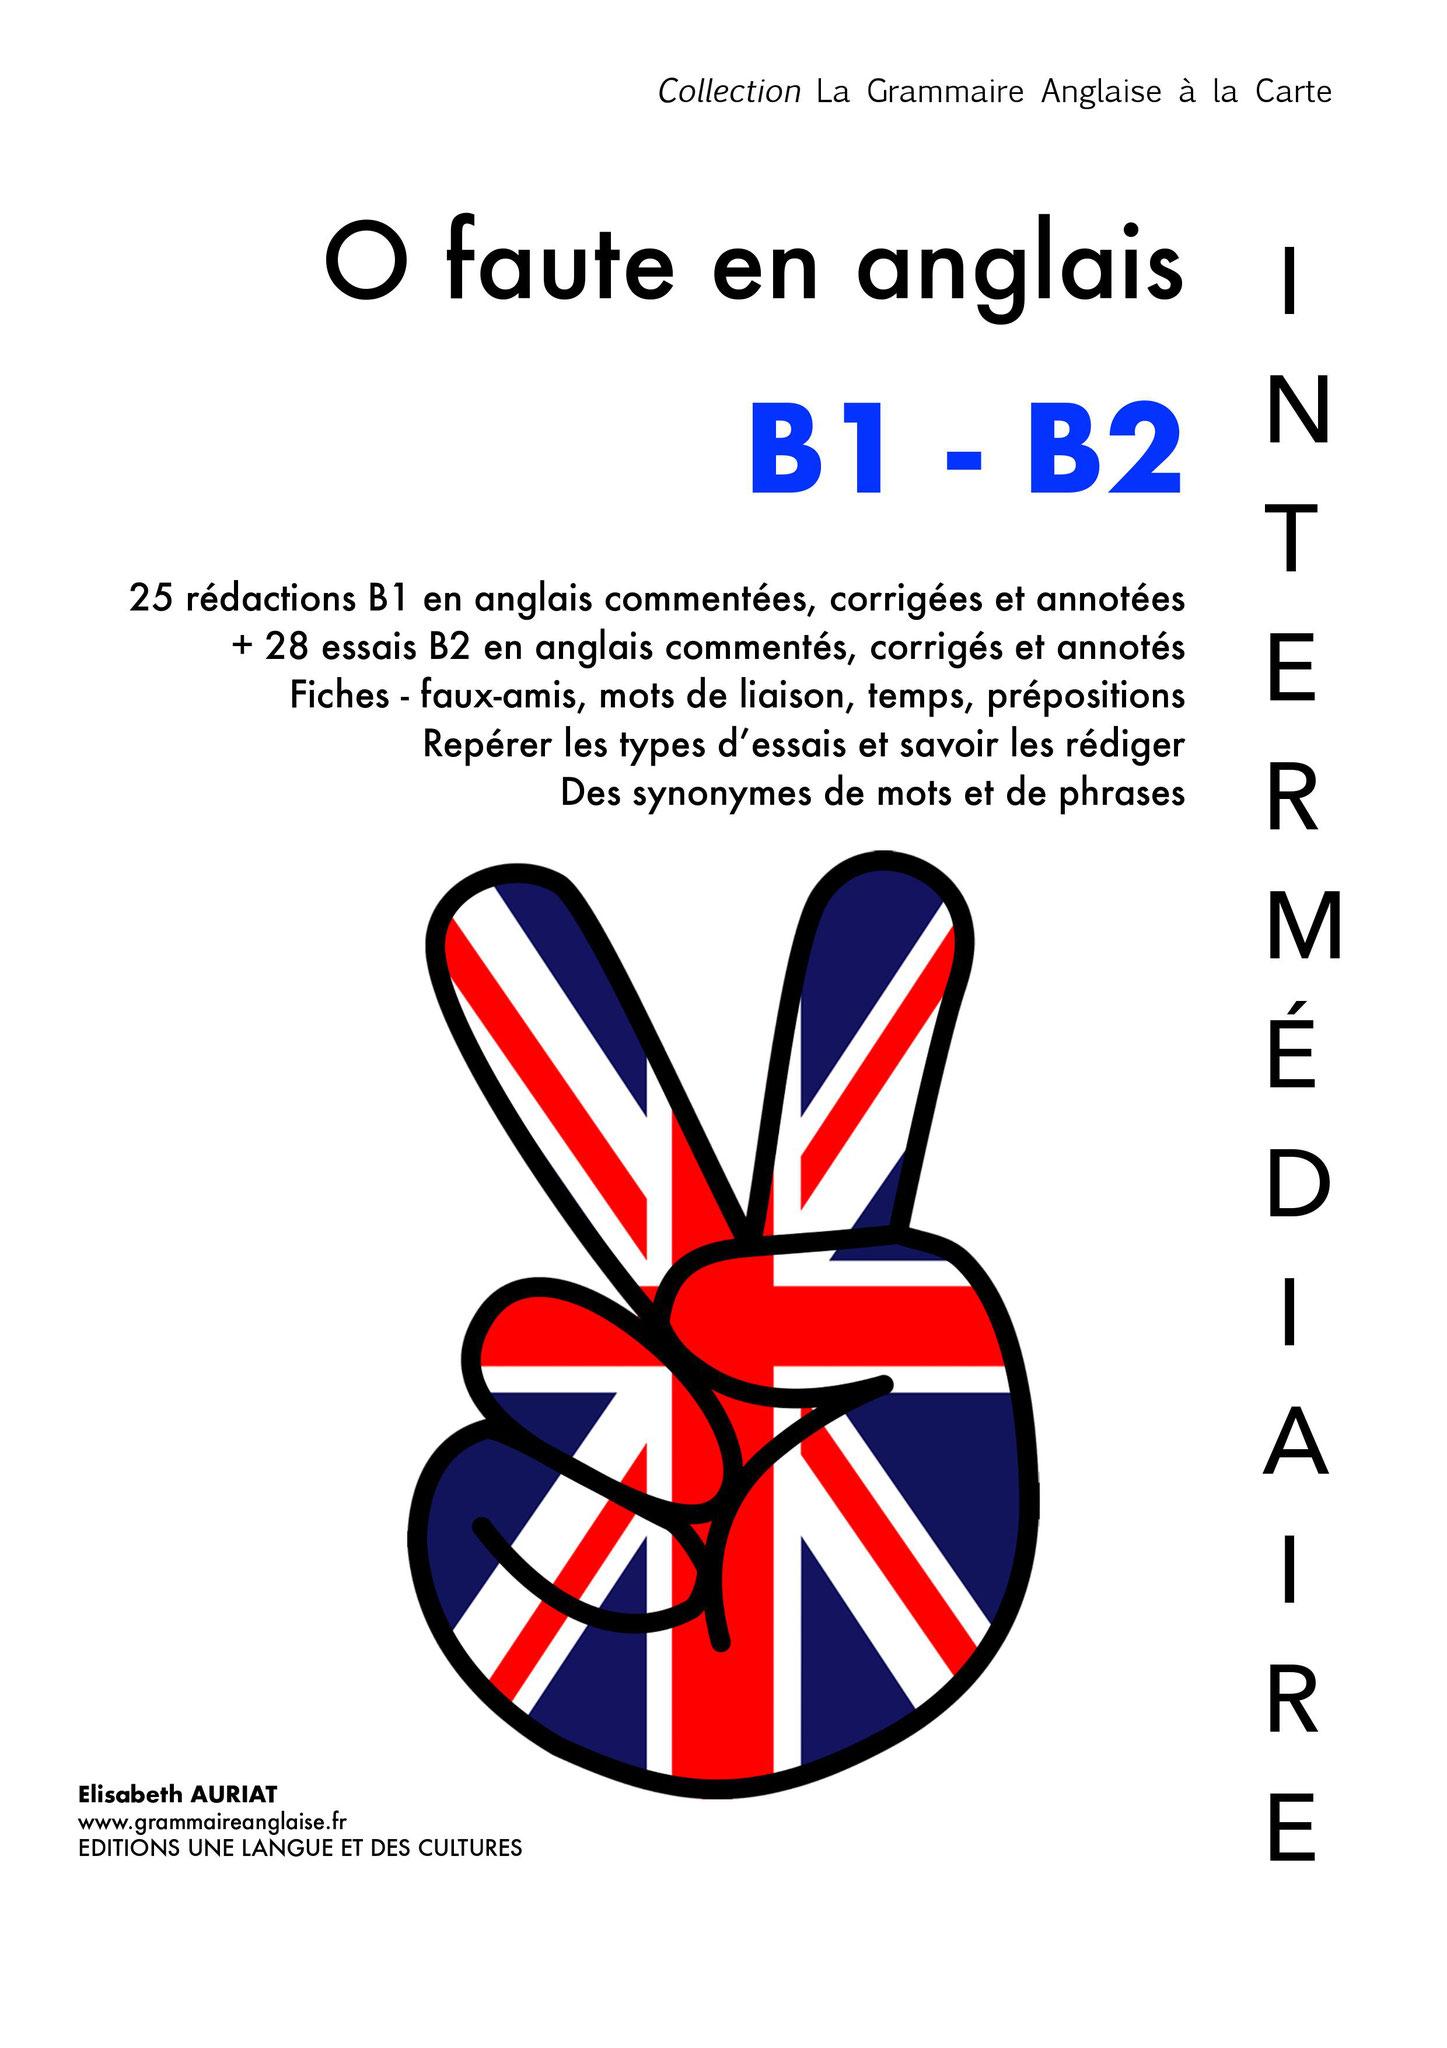 Livre Zéro faute en anglais B1/B2 INTERMEDIAIRE